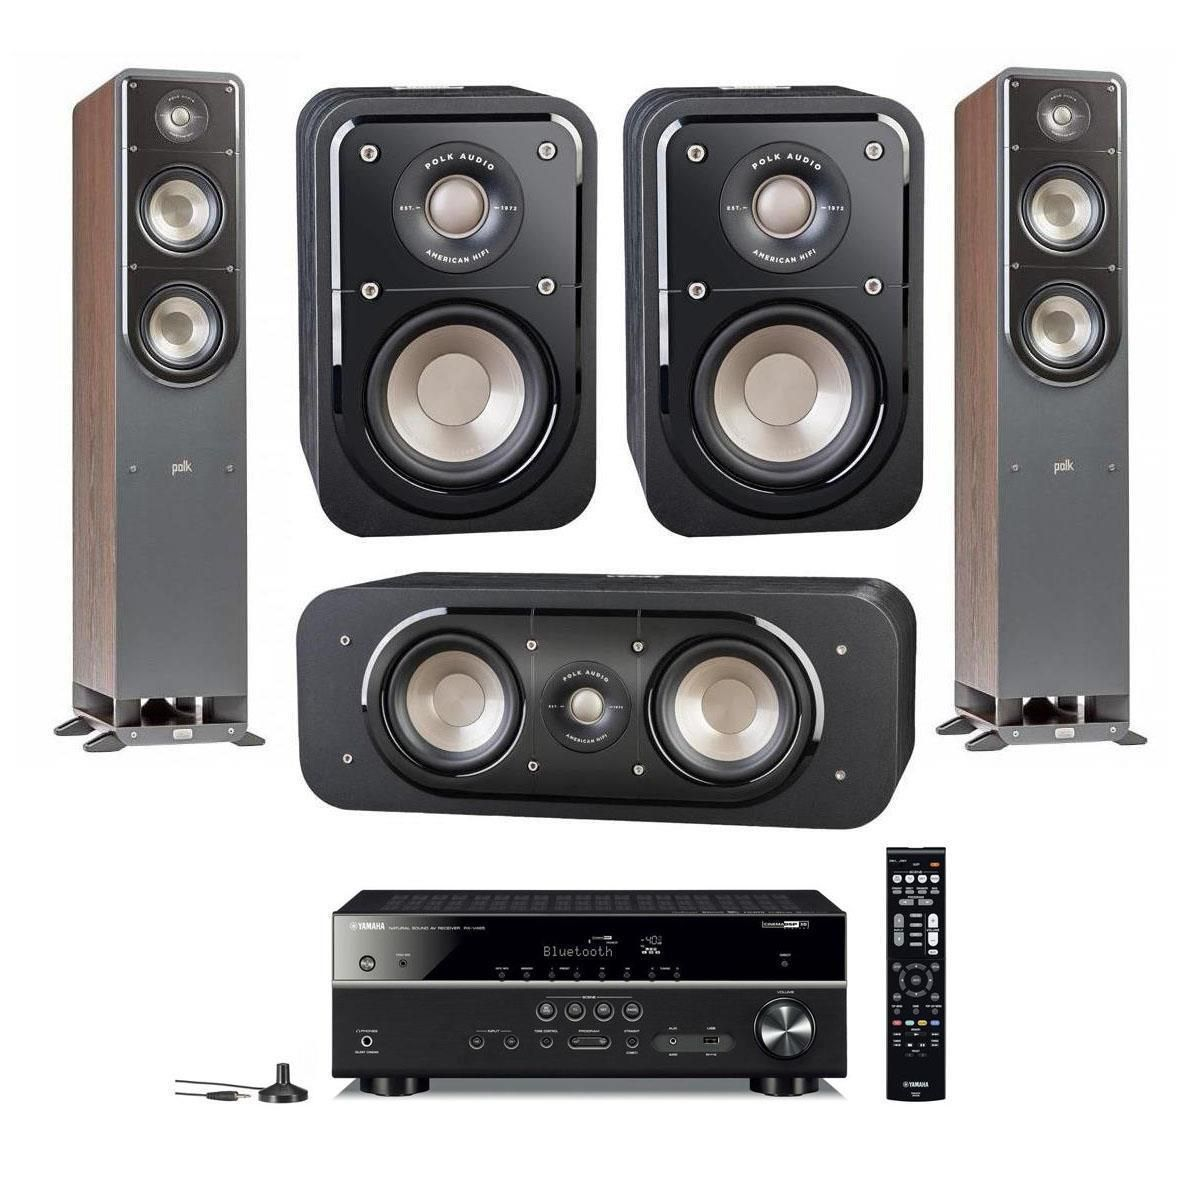 Polk Signature Speakers S50 S30 S10 Yamaha Rx V485 Receiver 780 S60 S30 S20 Yamaha Rx V685 Receiver 1250 More Polk Audio Polk Speaker